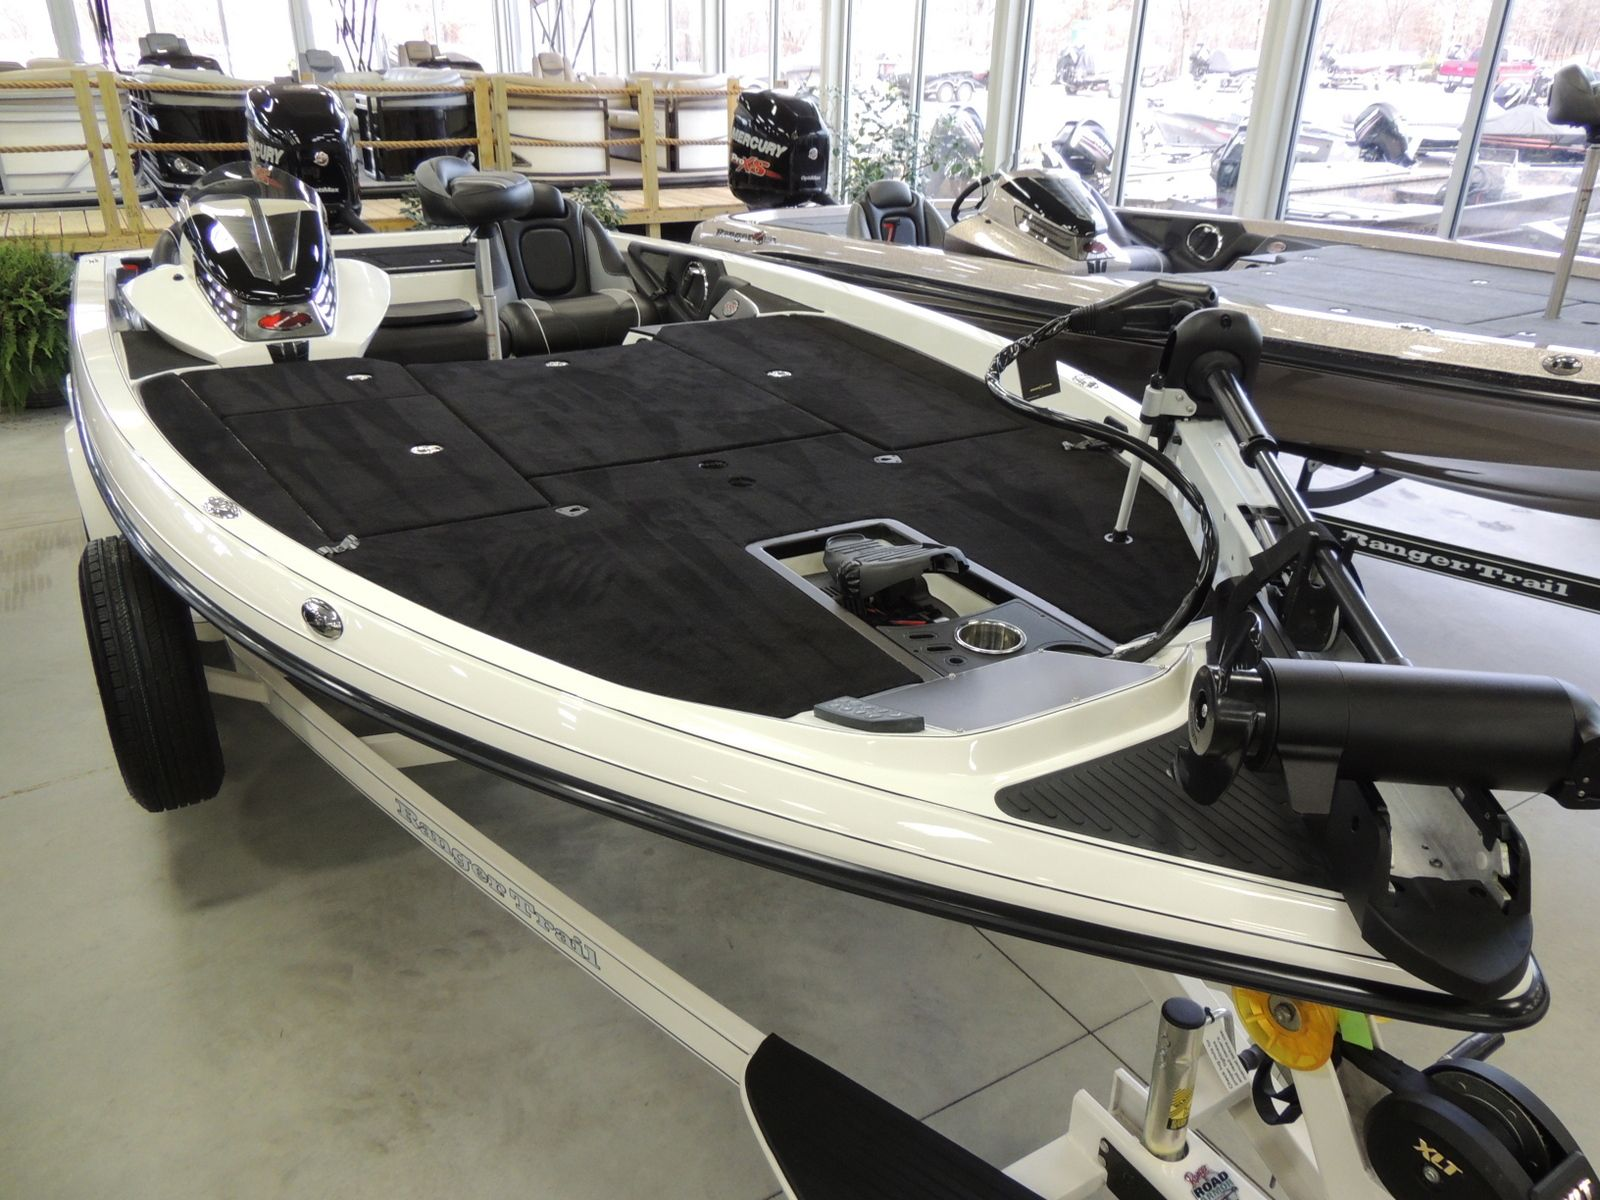 Replacement Carpet For Ranger Boats Carpet Vidalondon